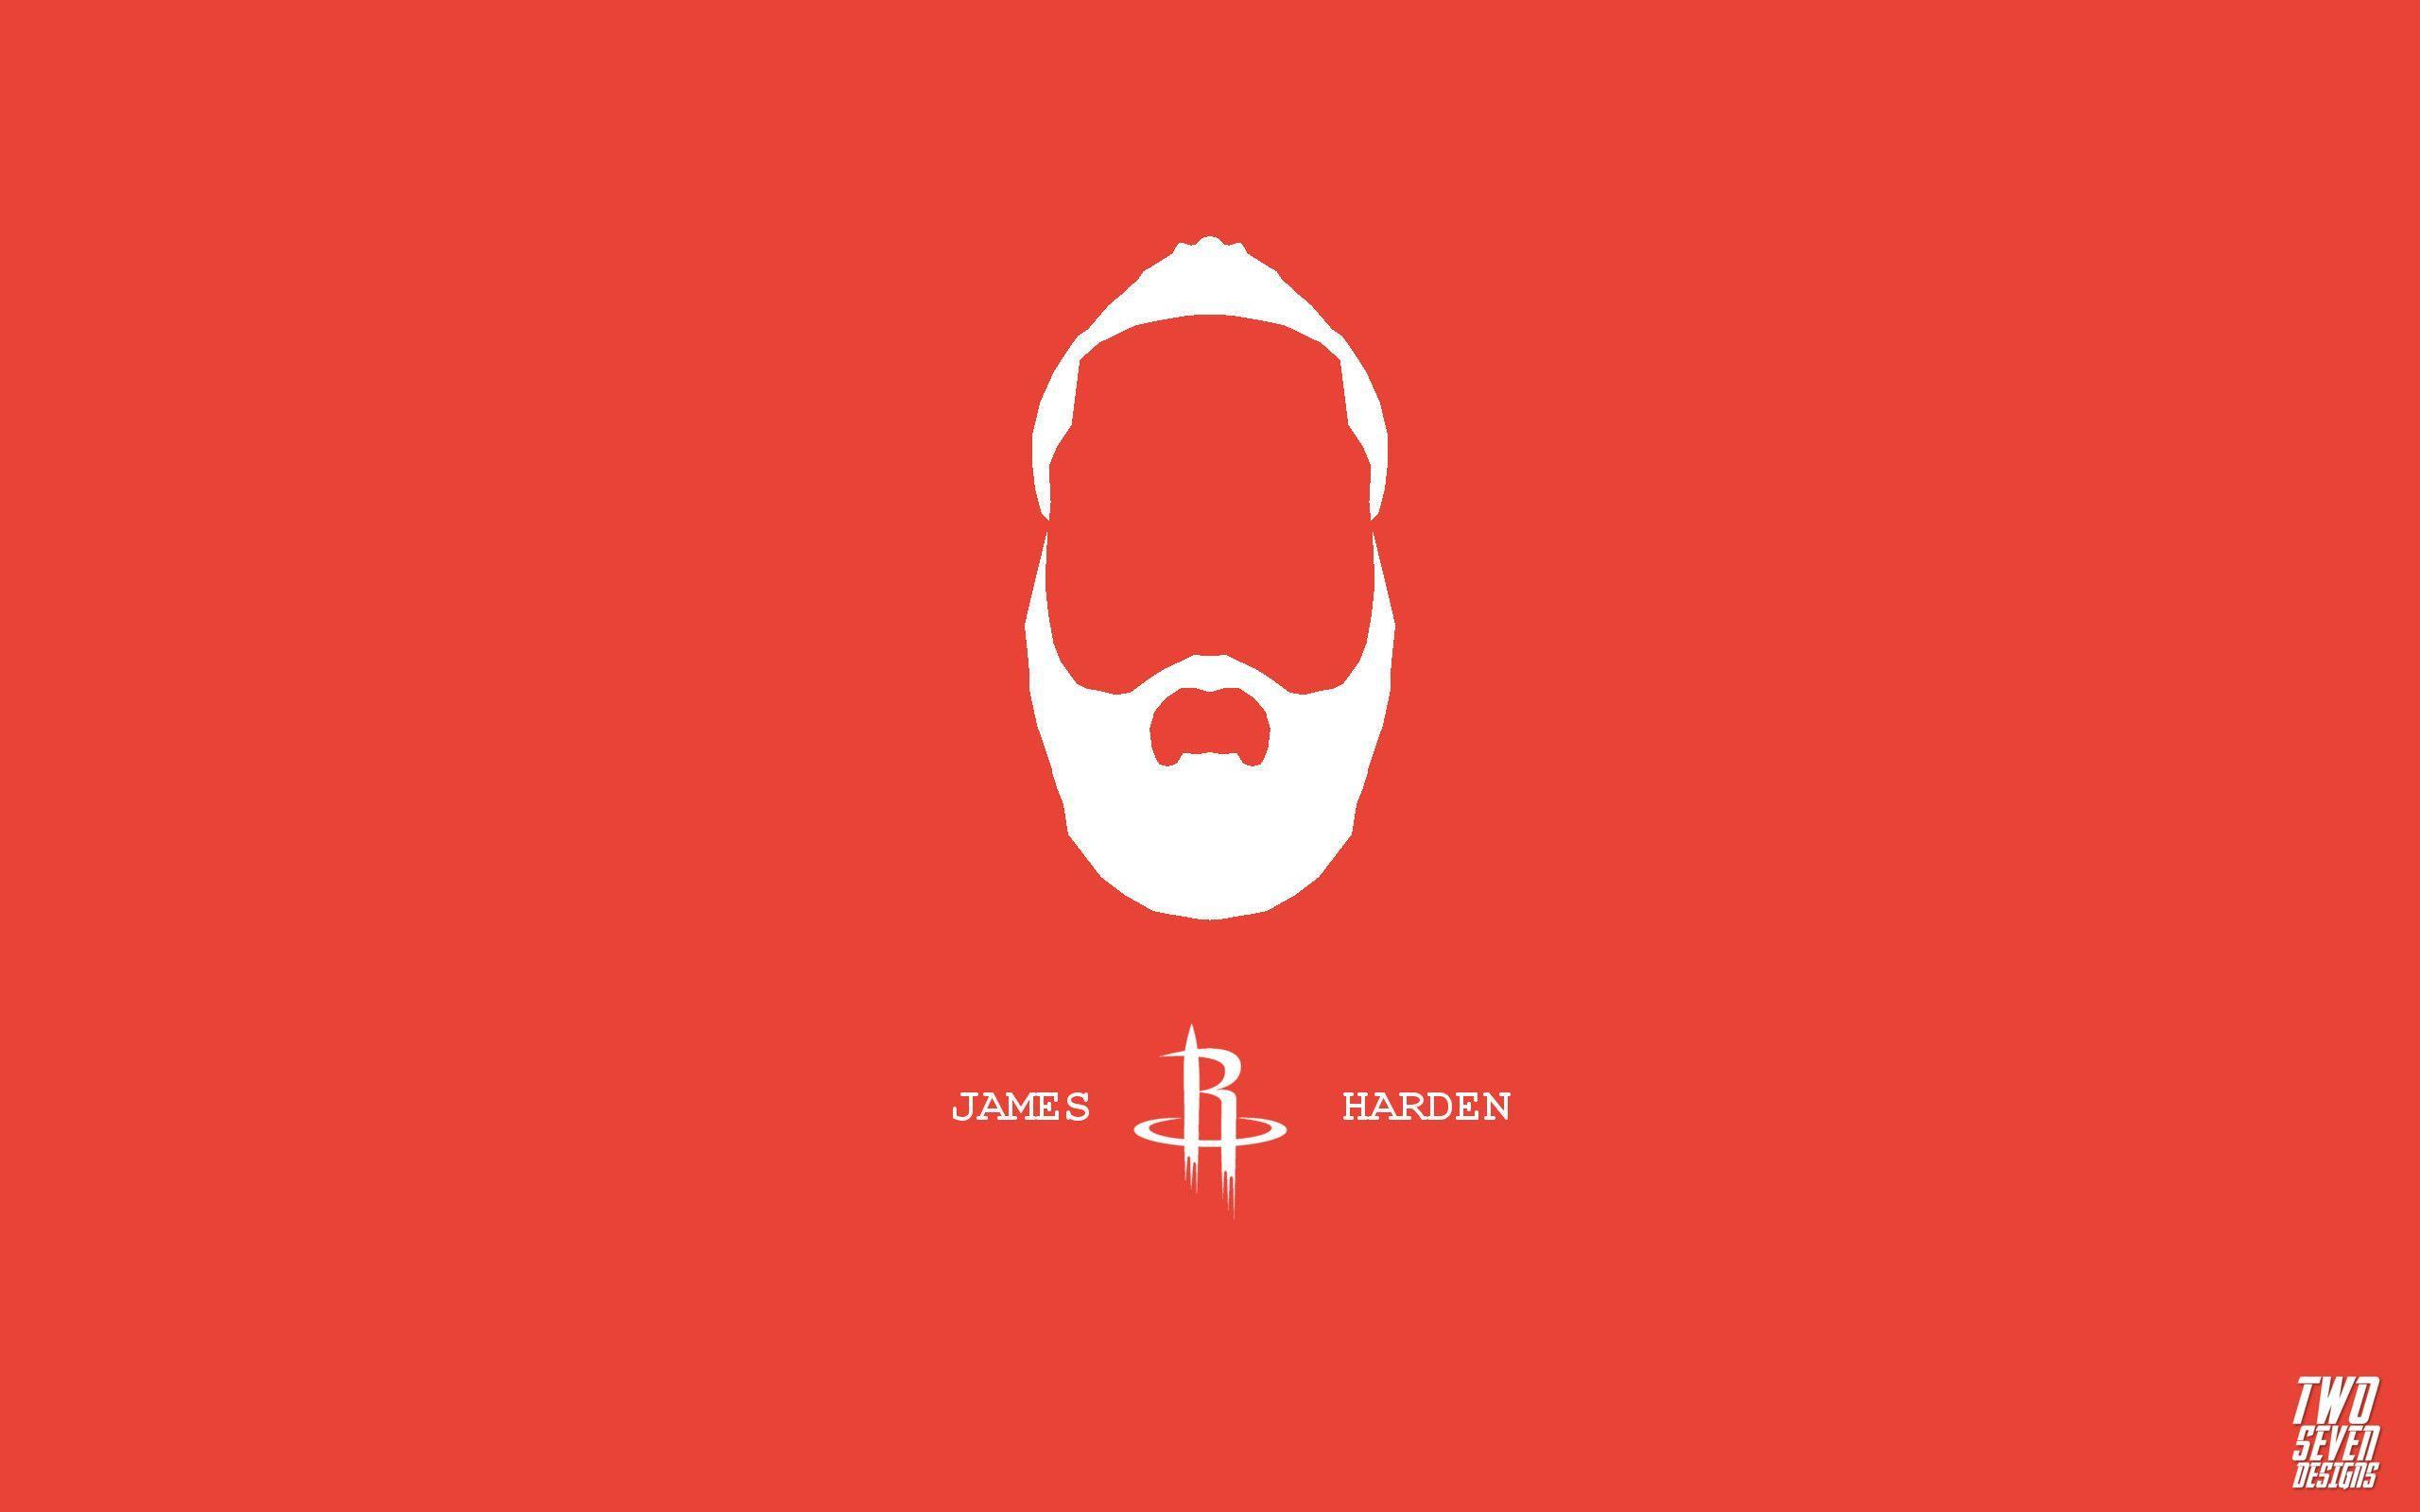 Houston Rockets James Harden Wallpapers Wallpaper Cave